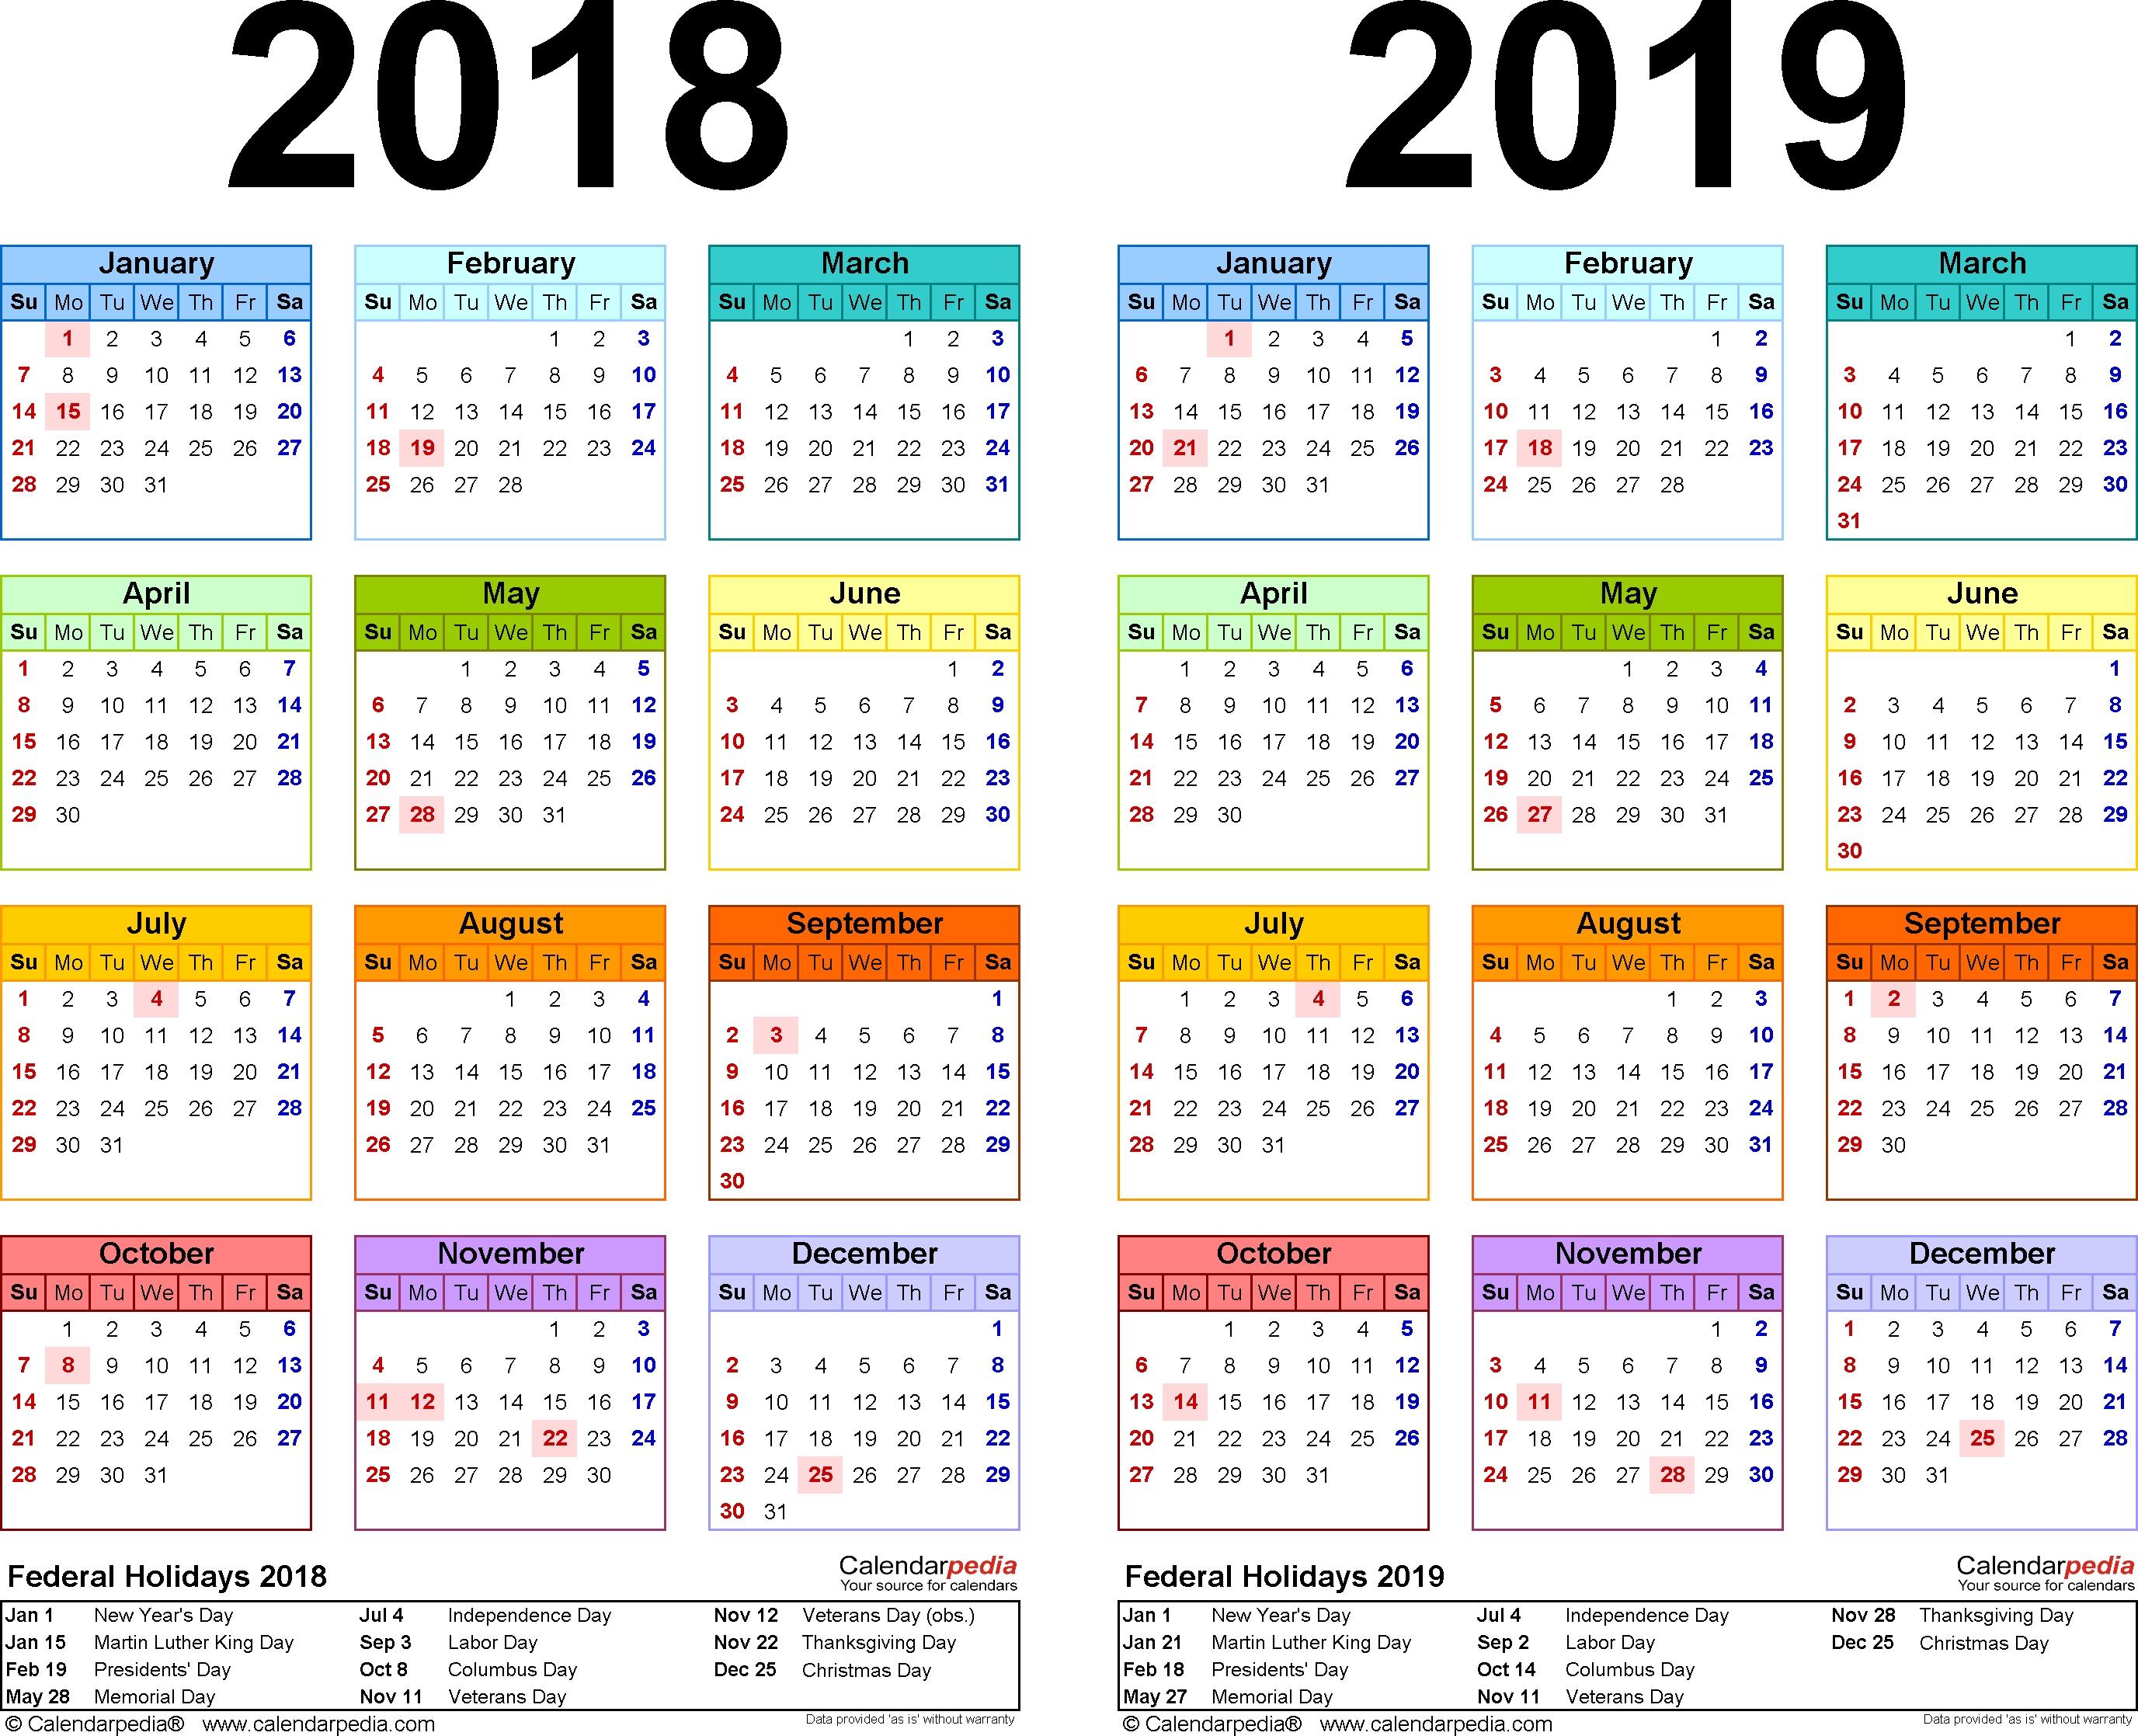 2018 2019 Calendar Free Printable Two Year Pdf Calendars